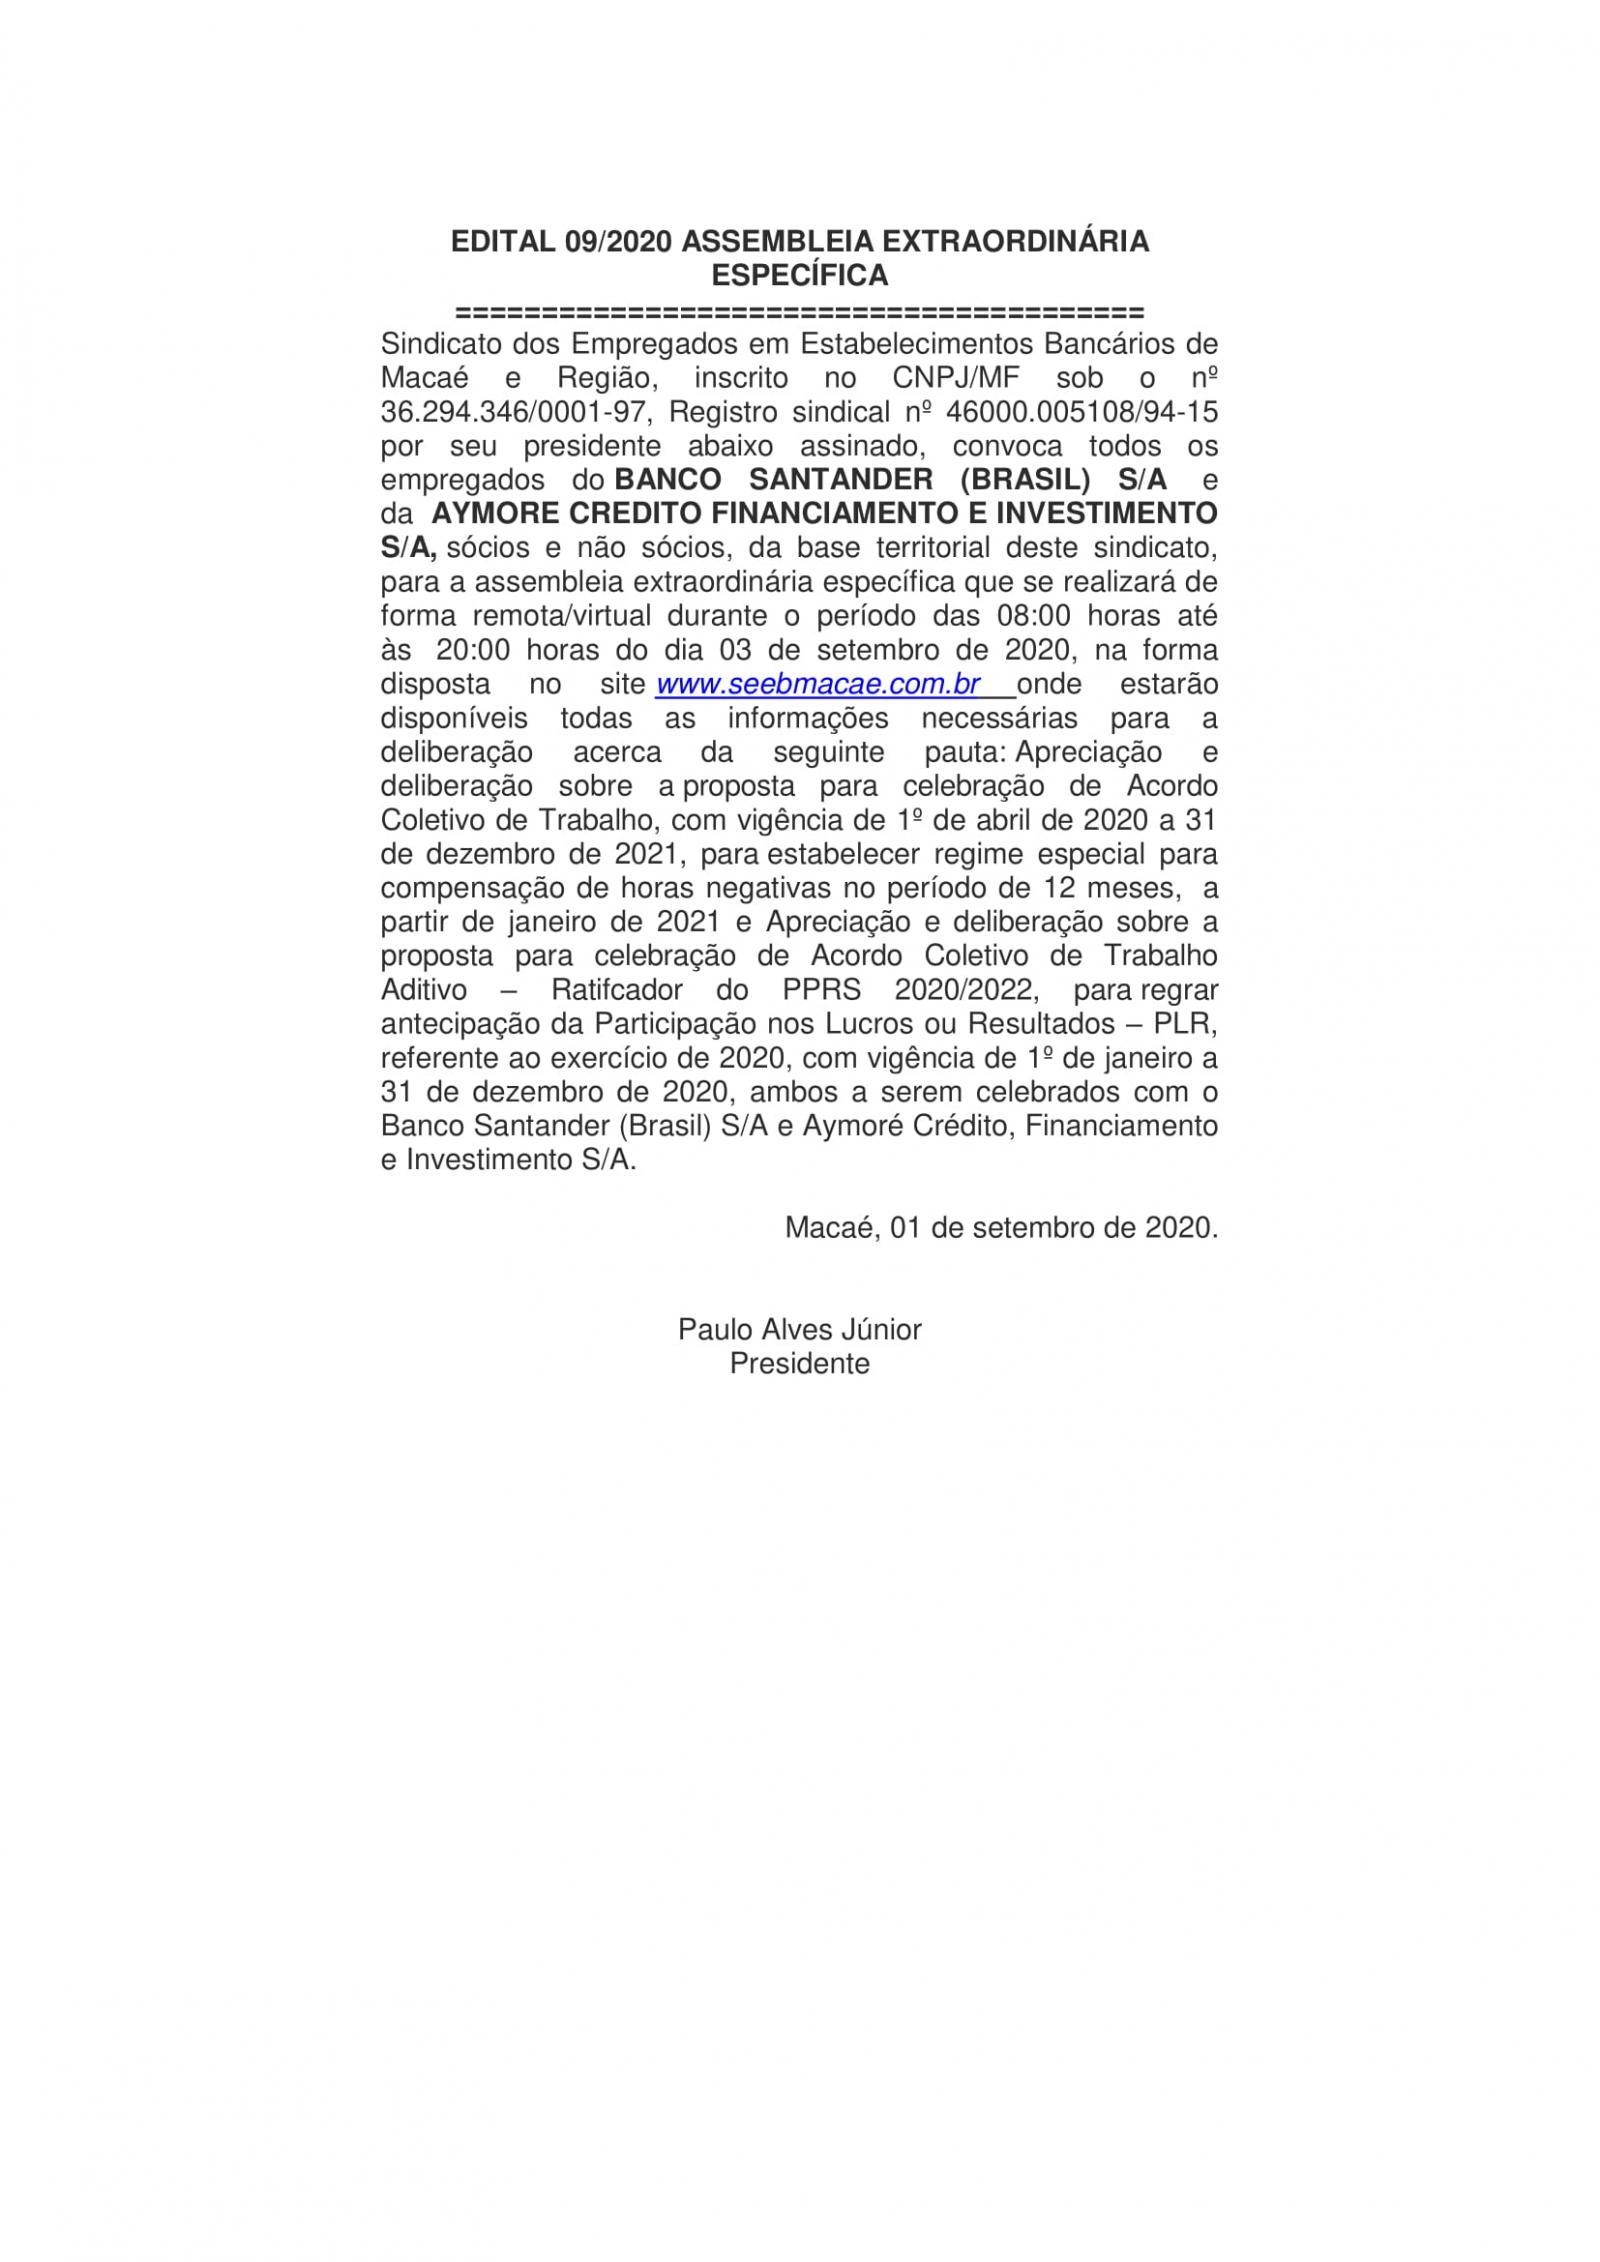 EDITAL 09/2020 ASSEMBLEIA EXTRAORDINÁRIA ESPECÍFICA